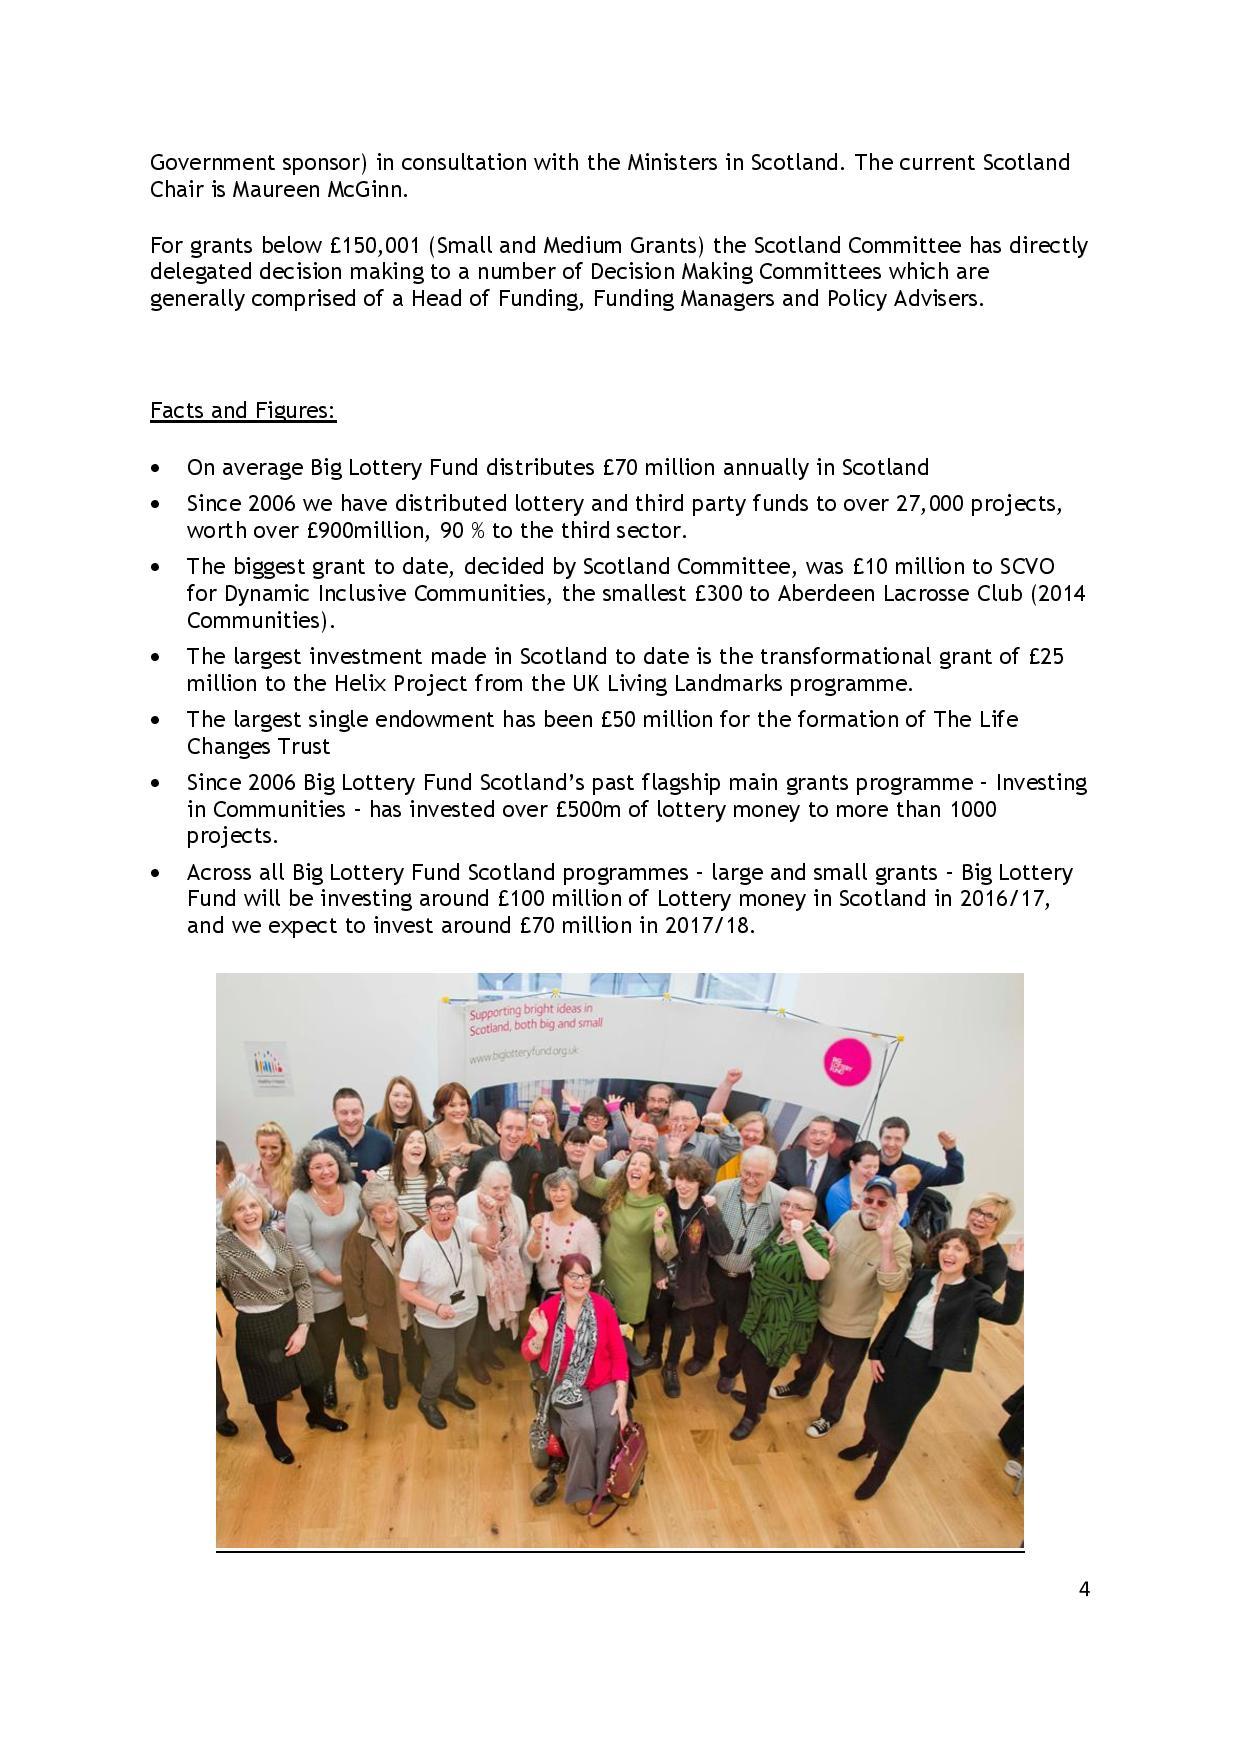 Big_Lottery_Fund_Scotland_Information_Briefing-page-004.jpg